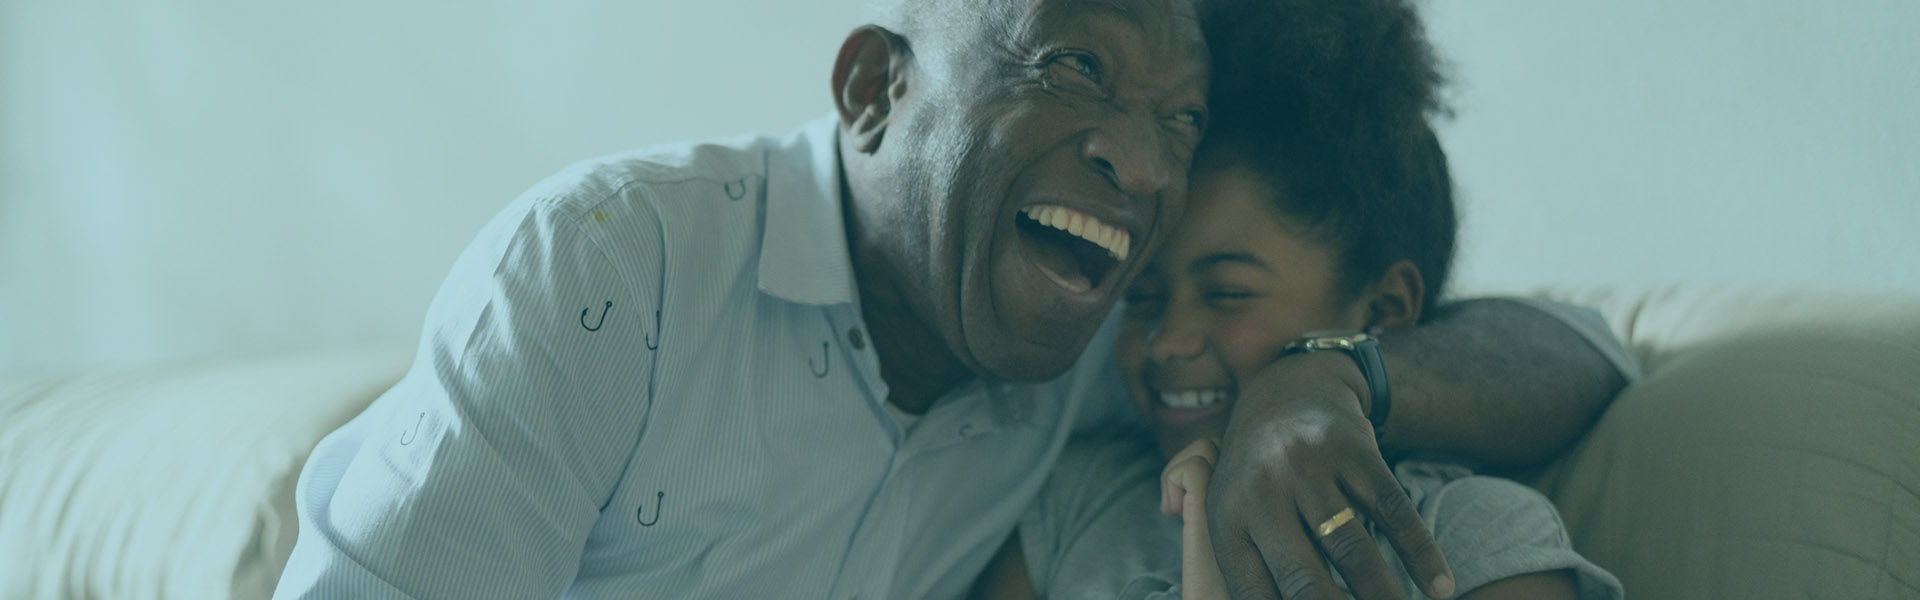 Savings Accounts Hero | Grandfather and Granddaughter